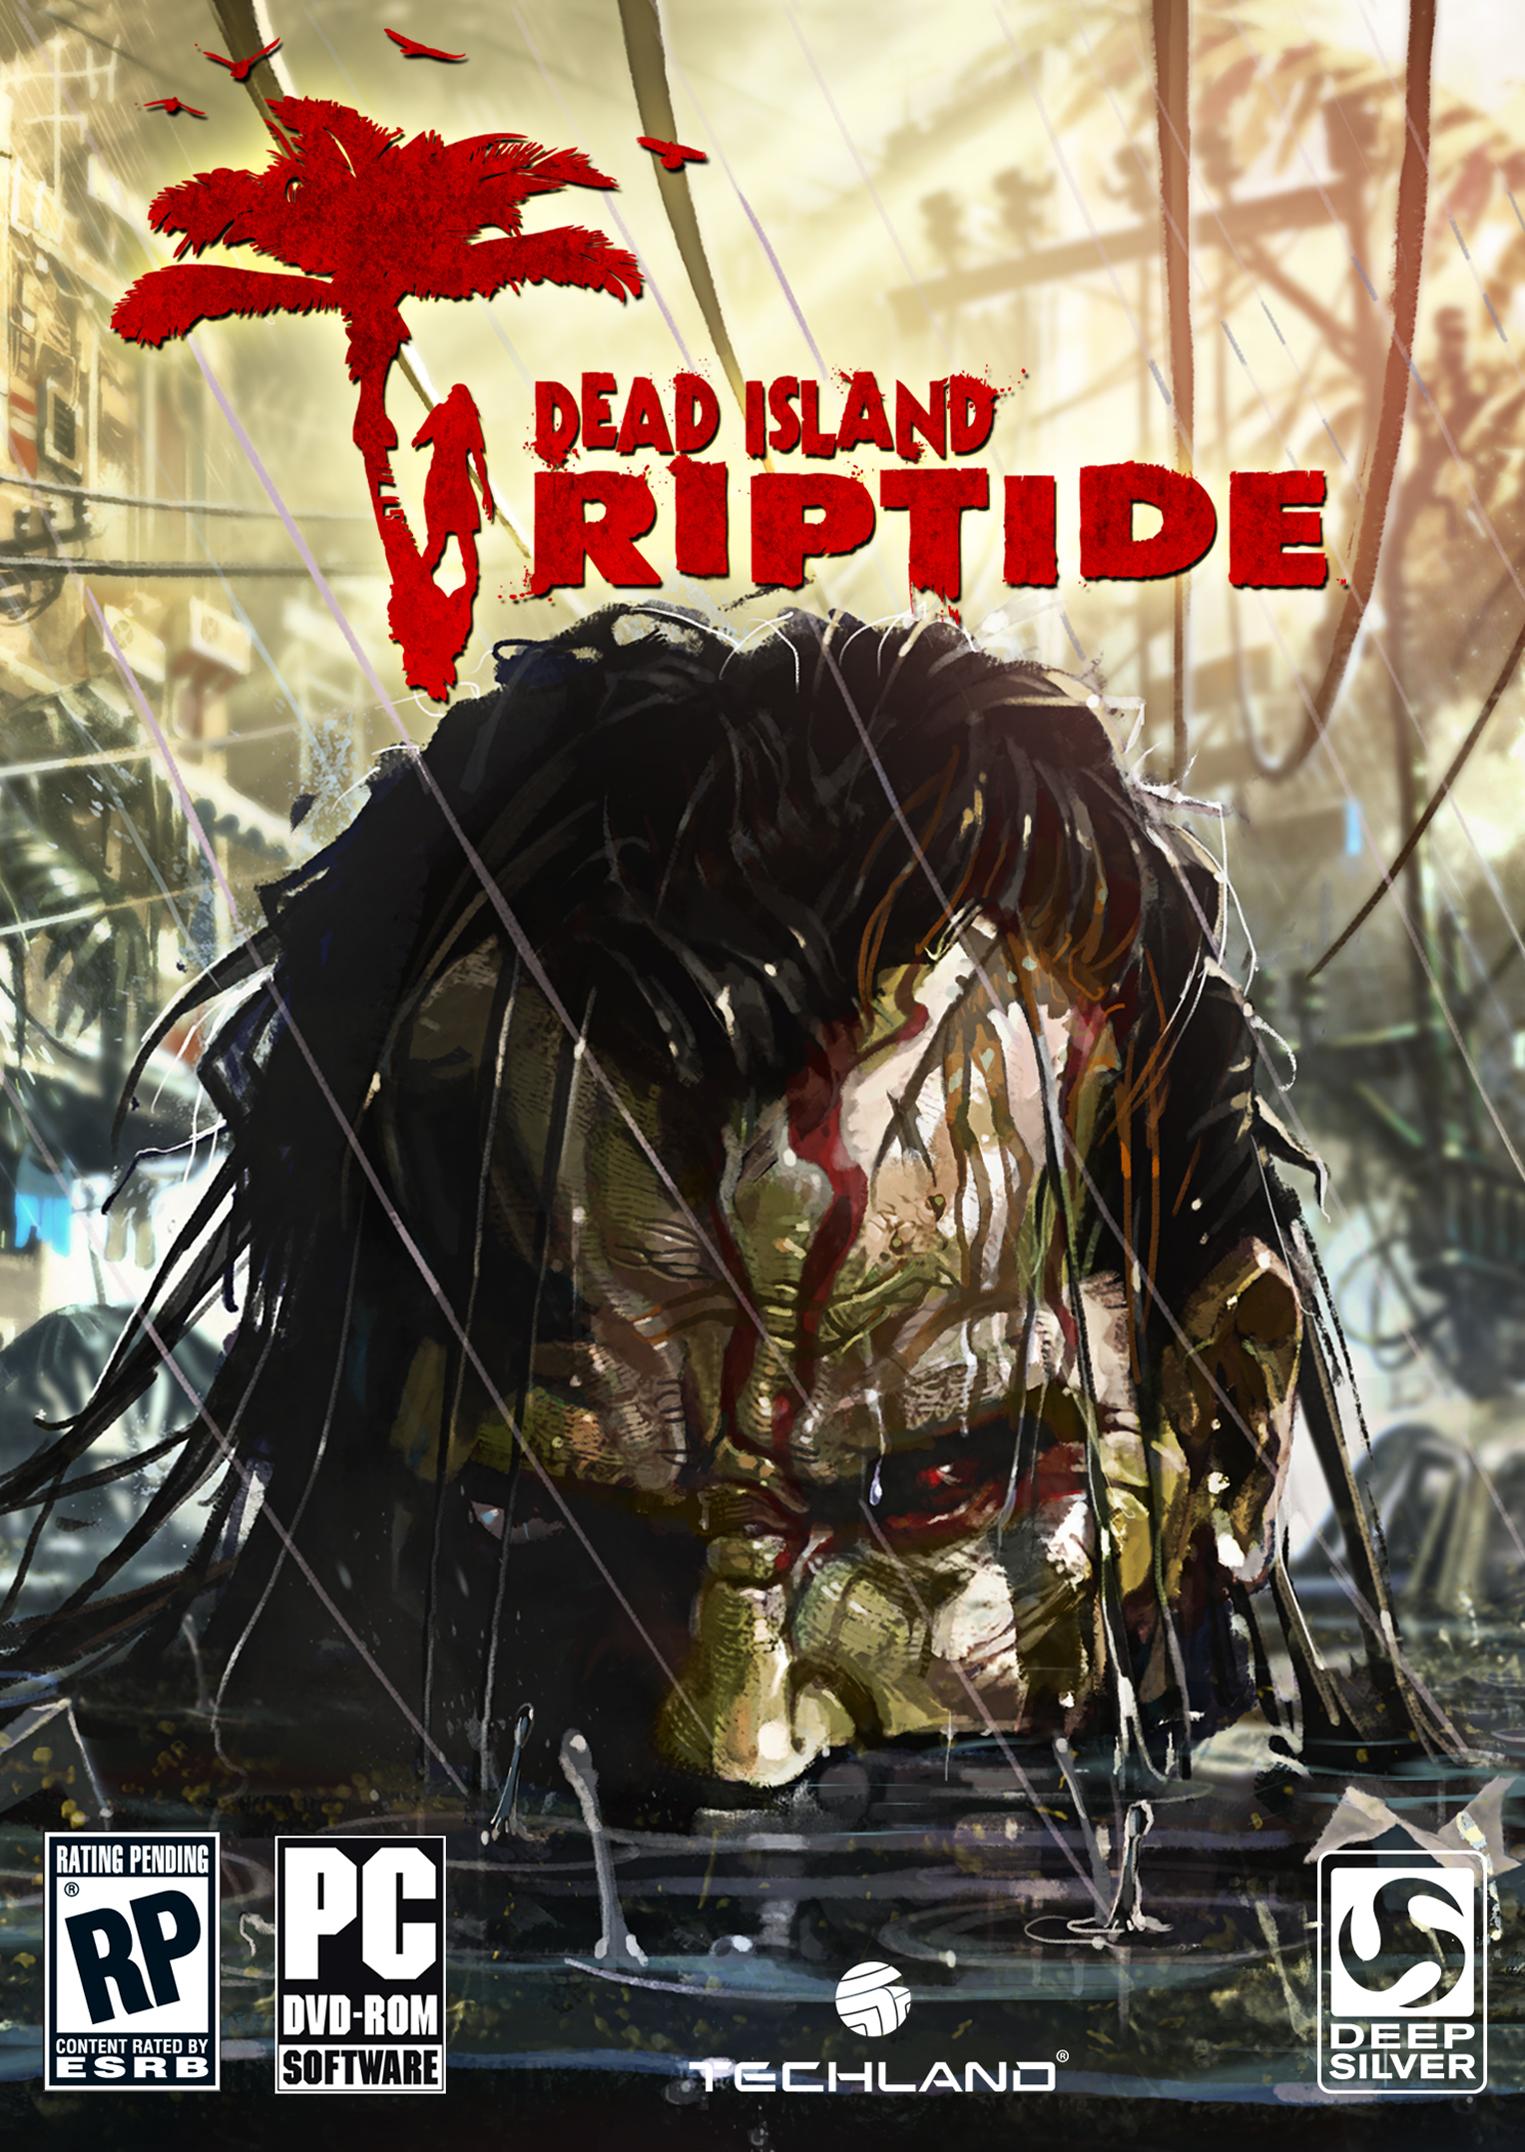 Скриншоты dead island: riptide галерея, снимки экрана, скриншоты.